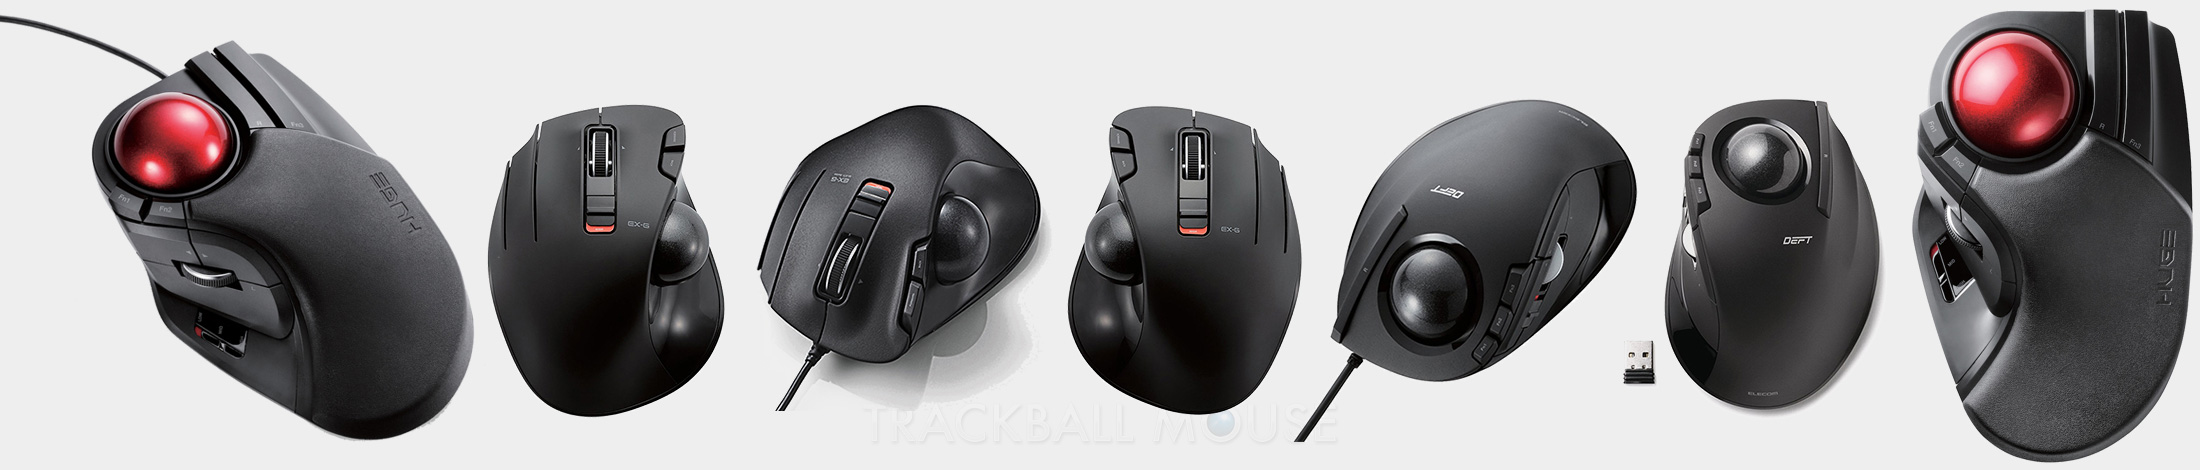 Elecom Trackball range explained ex-g deft huge